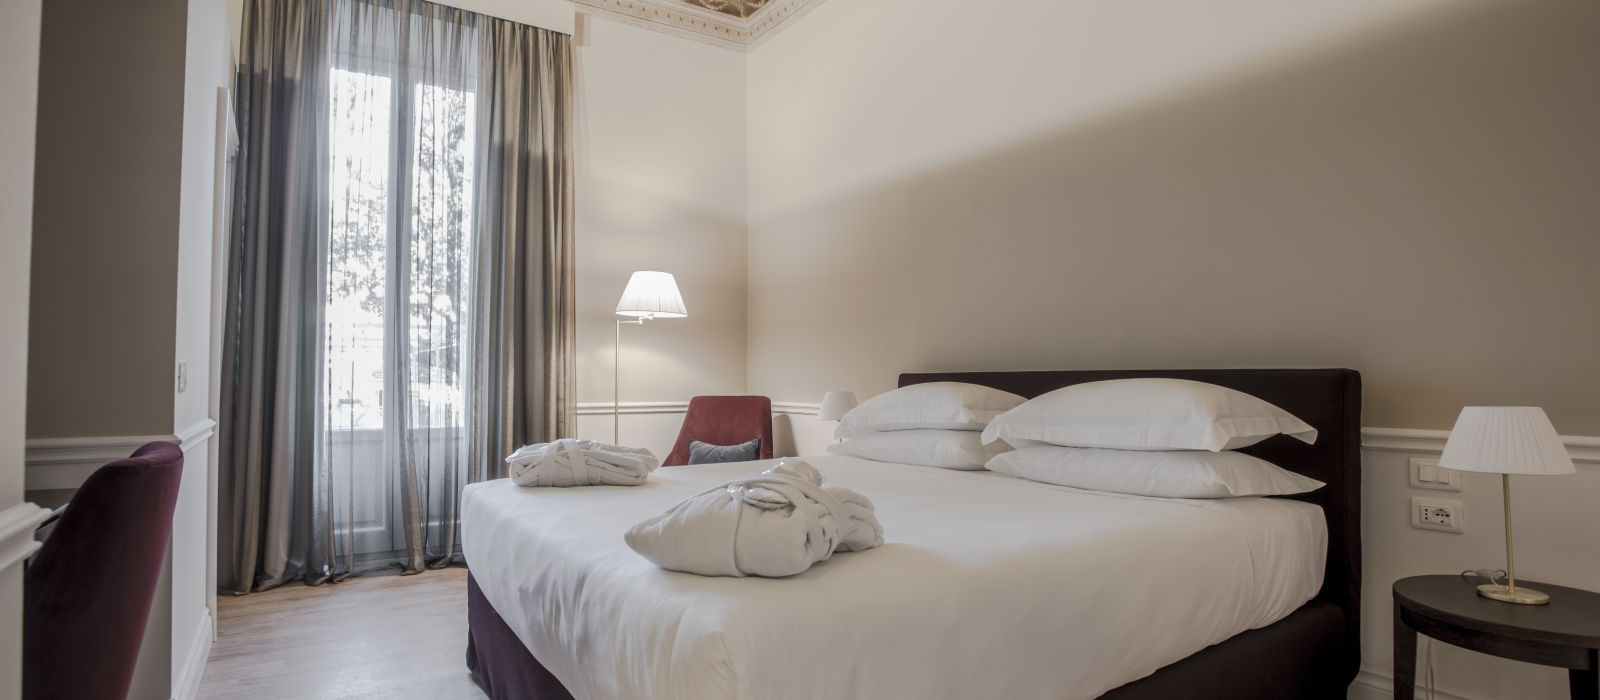 Hotel Palazzo Castri 1874 Italy